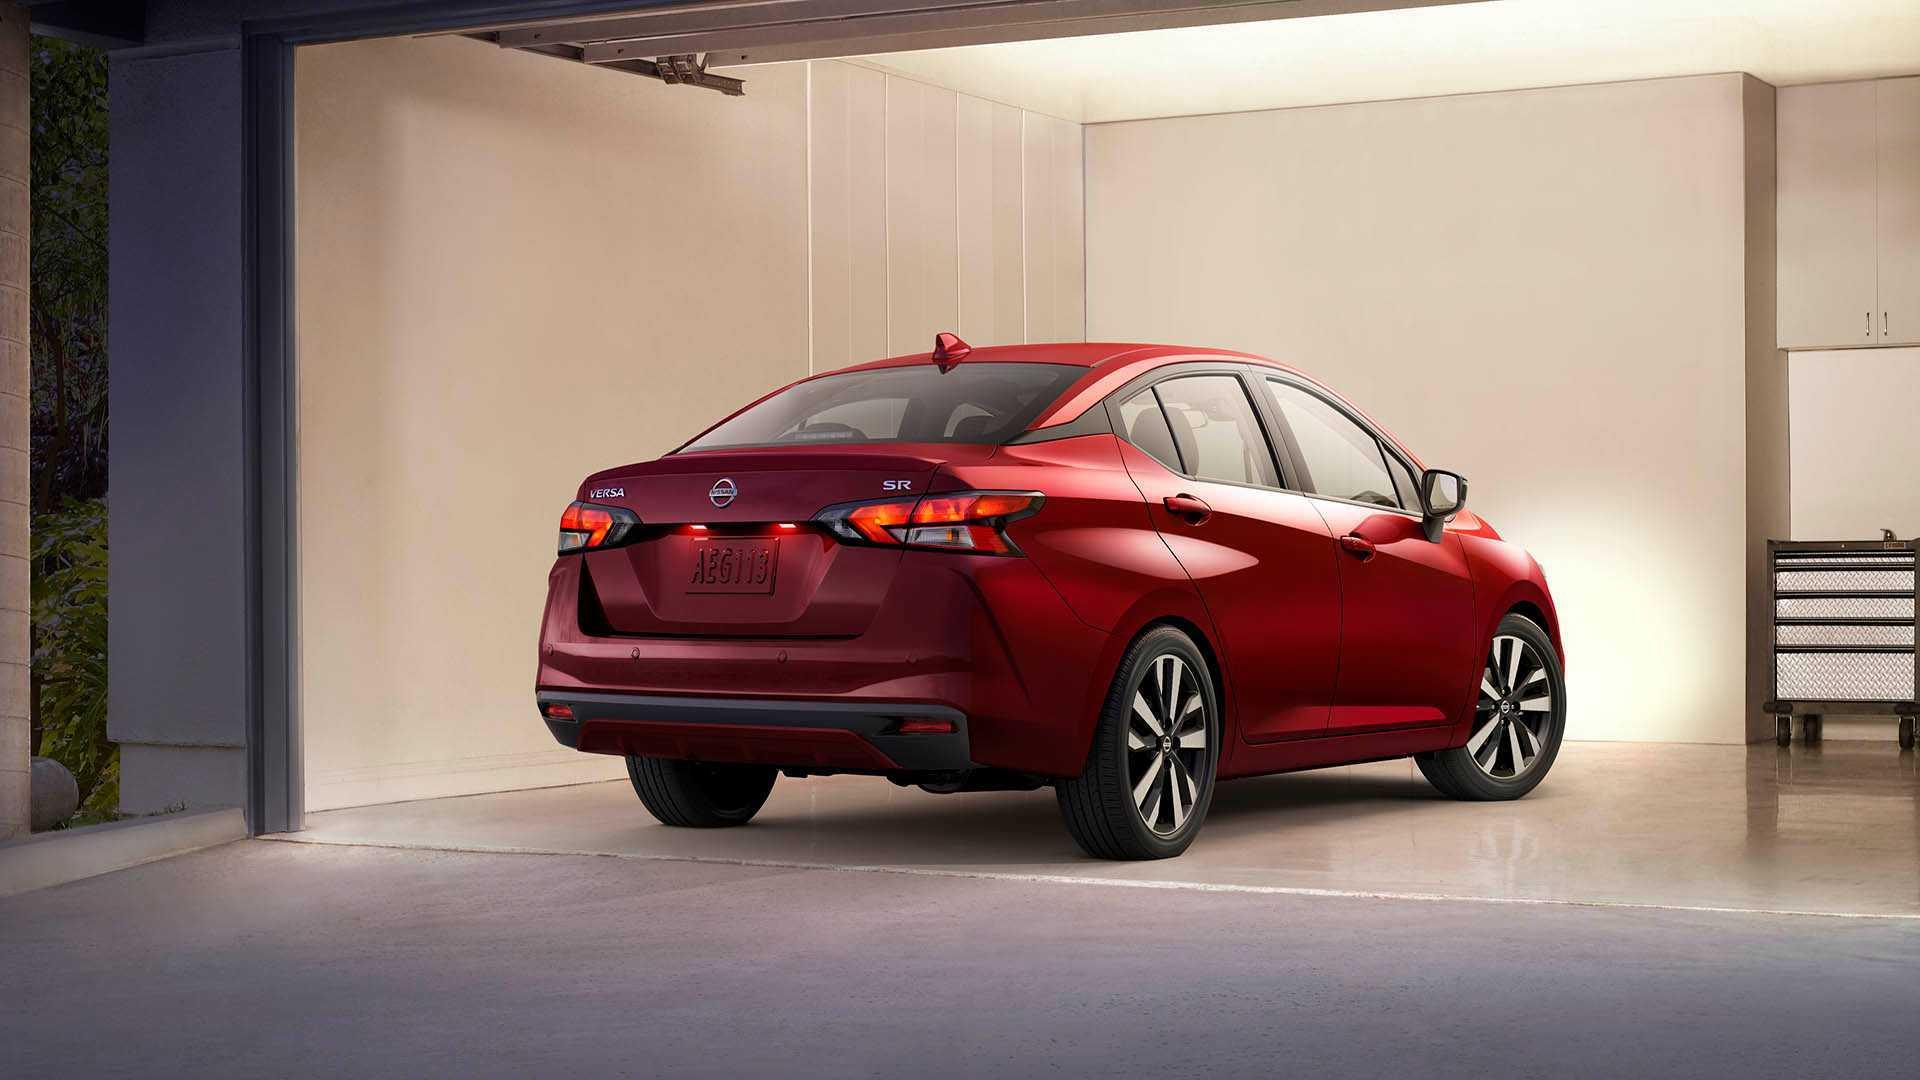 2020 Nissan Versa Starts At $14,730, Sporty SR Costs $18,240